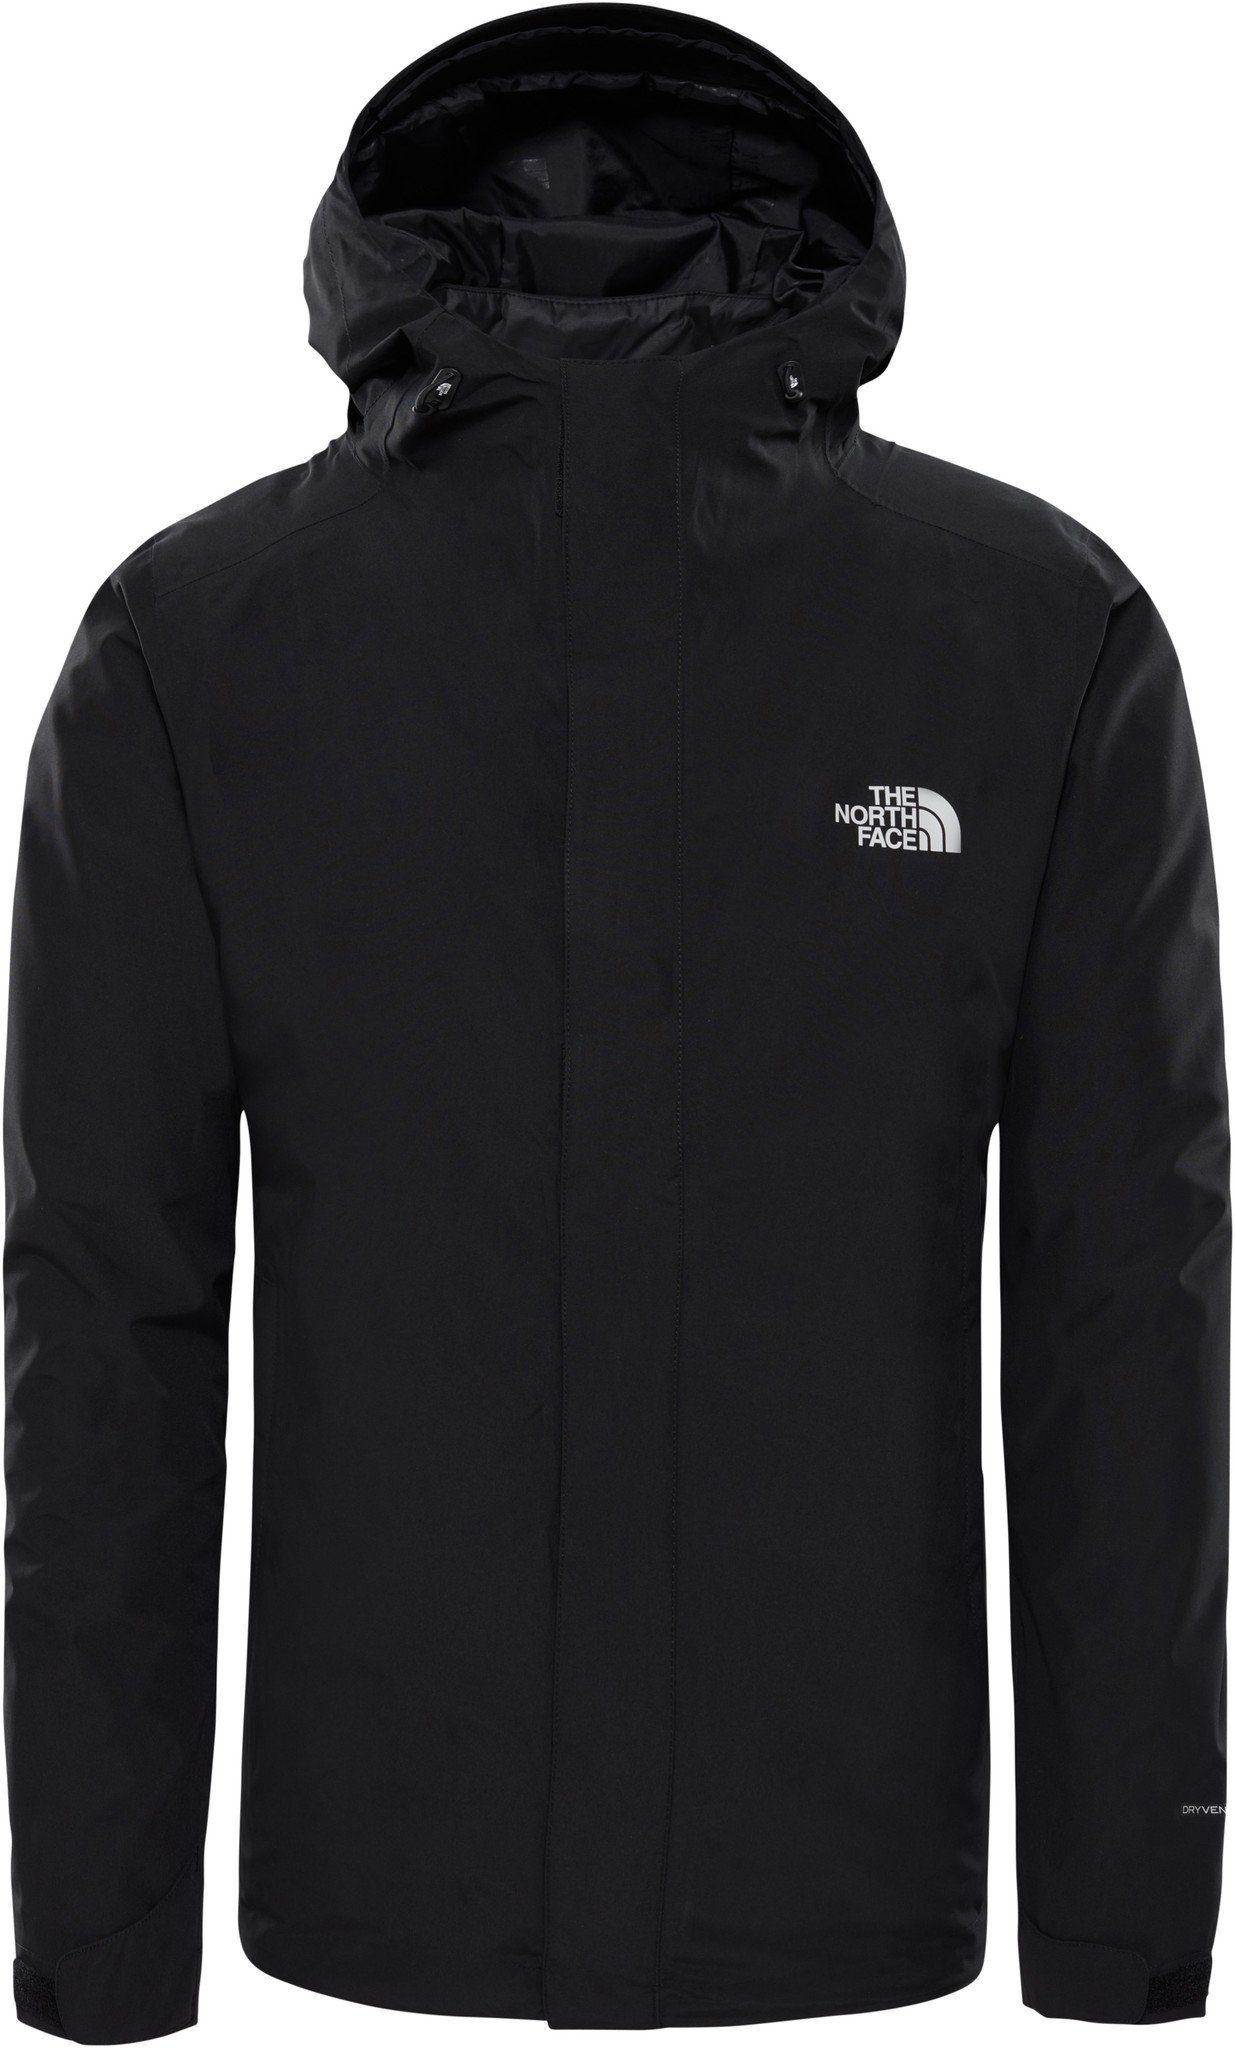 North Face »merak Herren« KaufenOtto The Jacket Online Triclimate Outdoorjacke TFJ1clK